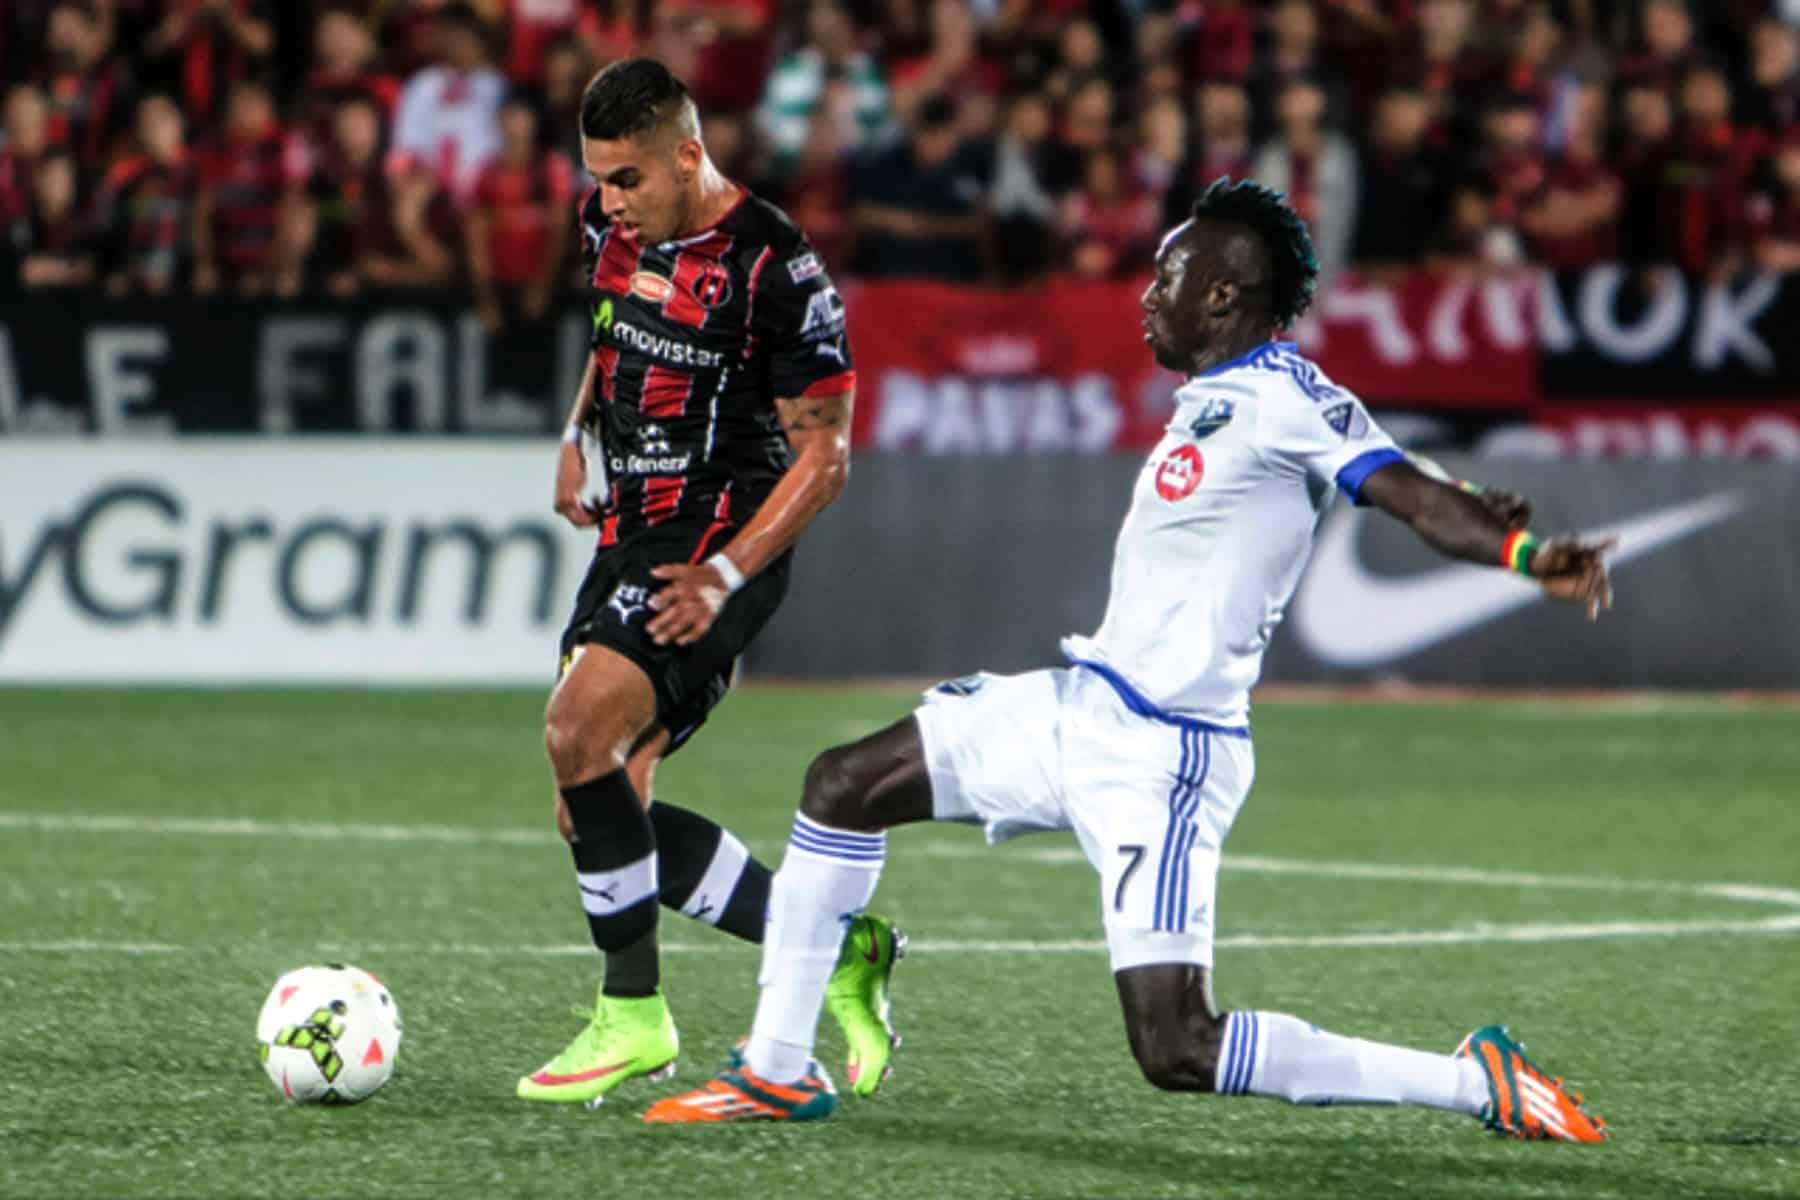 Alajuelense - Impact CONCACAF Champion's League semifinal match